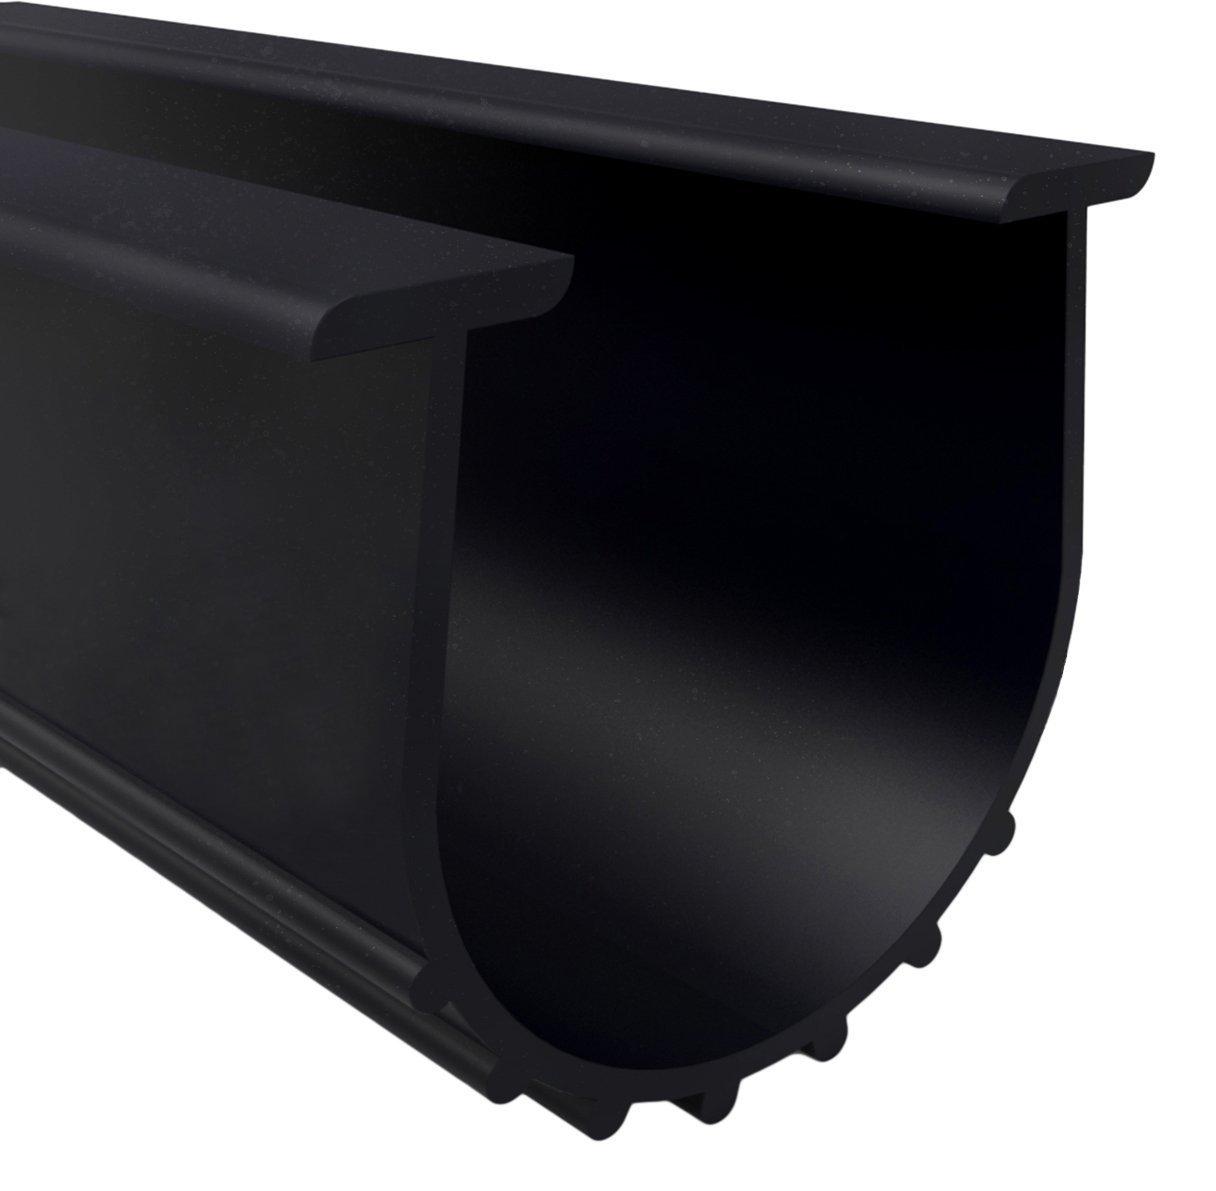 "Loobani Garage Door Bottom Weather Stripping Rubber Seal Strip Replacement, 5/16"" T Ends, 3 3/4"" Width X 20 Feet Lenth (Black)"